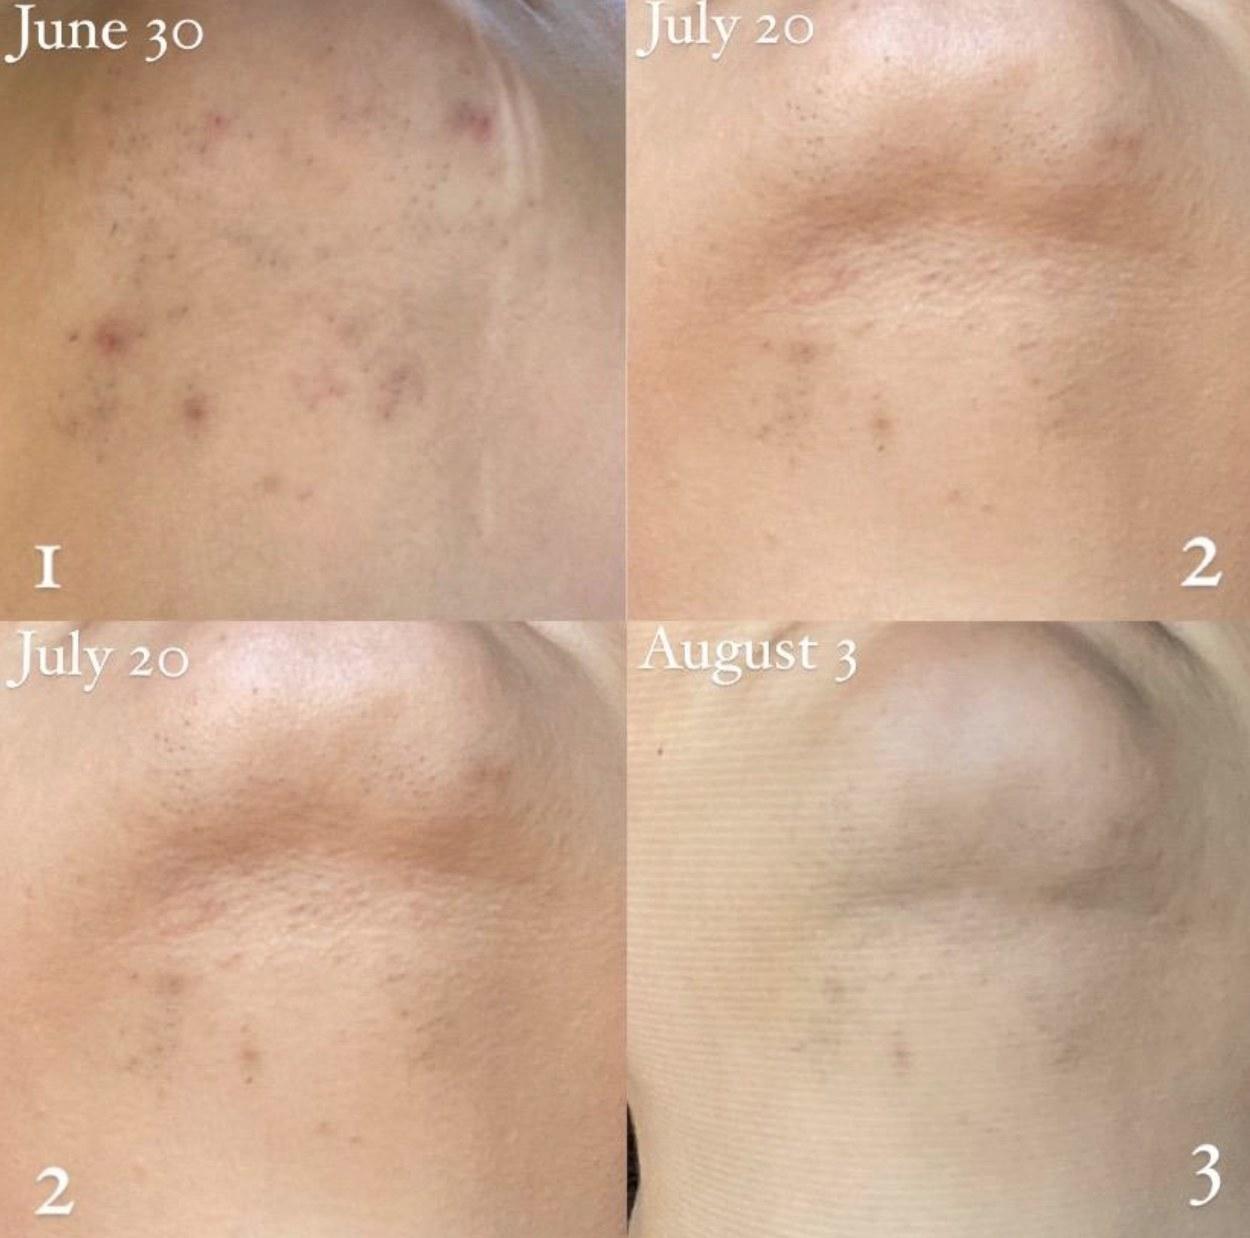 The progress photo of someone's skin